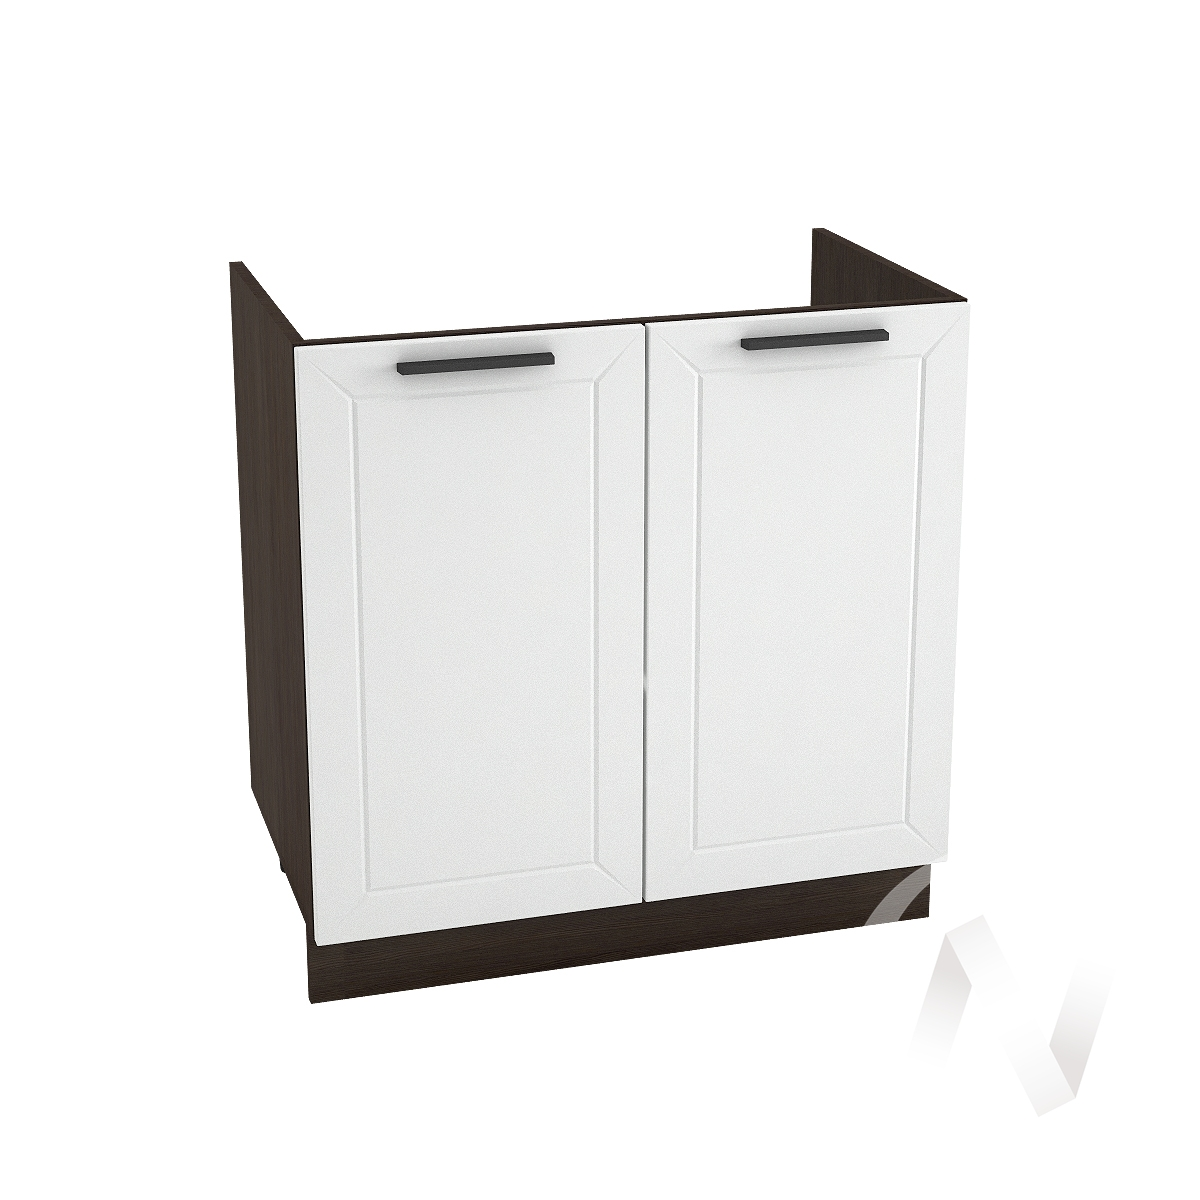 "Кухня ""Глетчер"": Шкаф нижний под мойку 800, ШНМ 800 (Айленд Силк/корпус венге)"